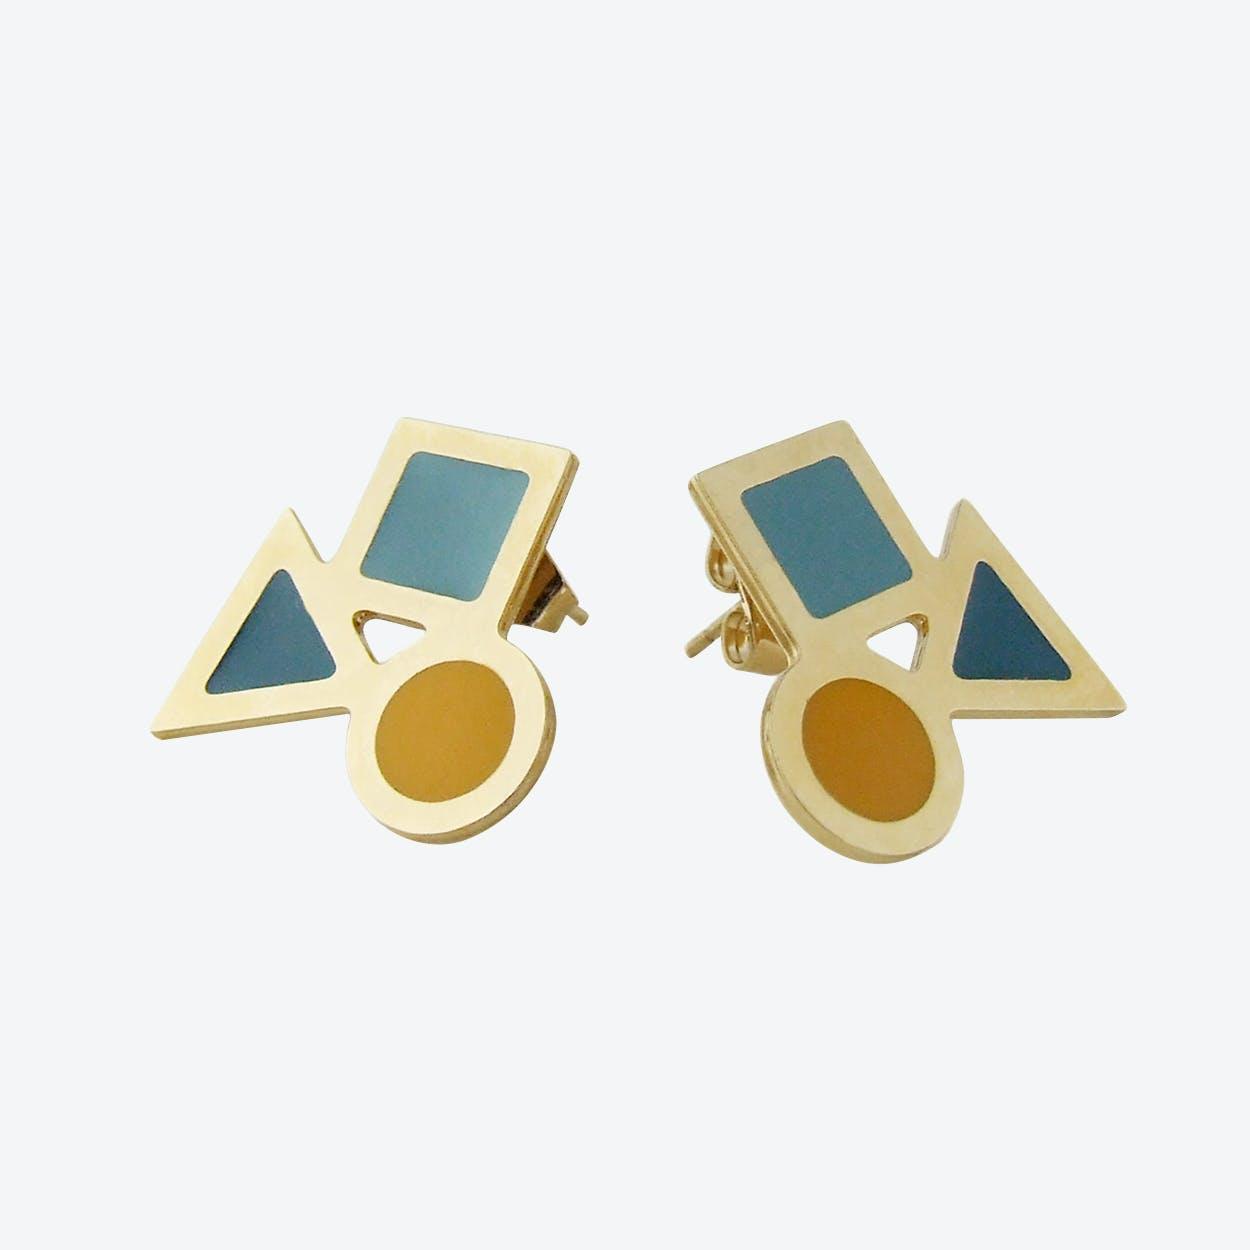 Big Geometric Stud Earrings in Emerald Duck Egg and Mustard